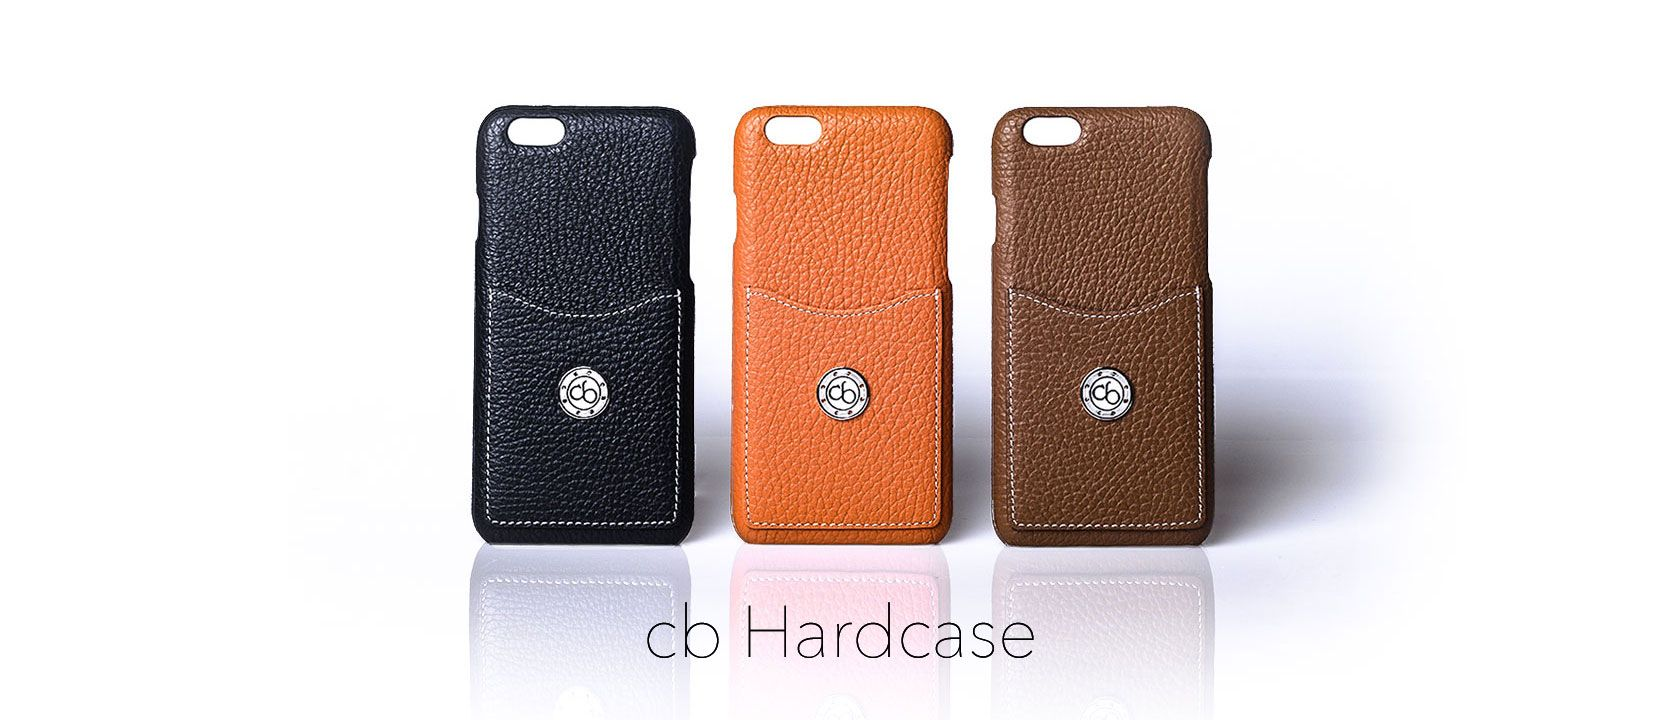 cb Hardcase